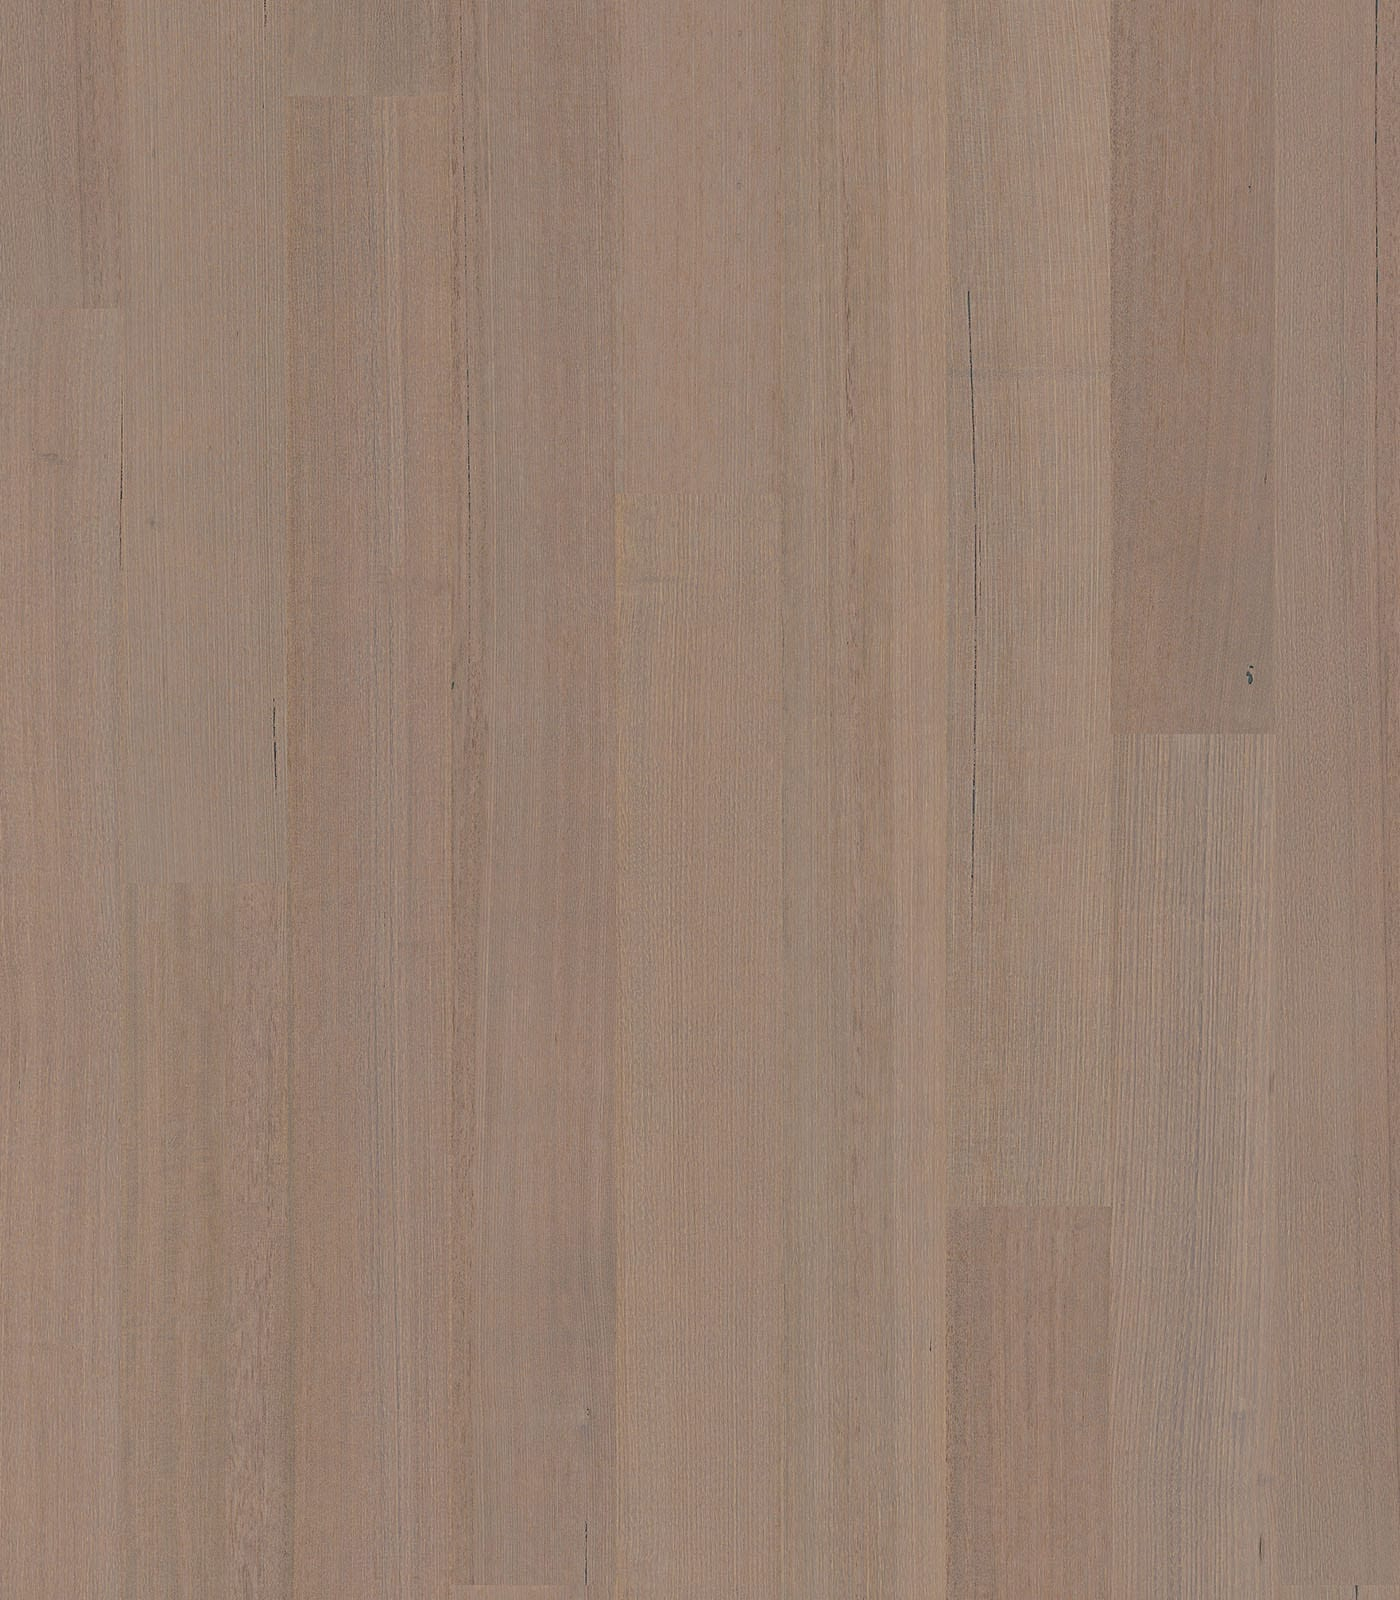 Esperance-Tasmanian Oak floors-After Oak collection-flat